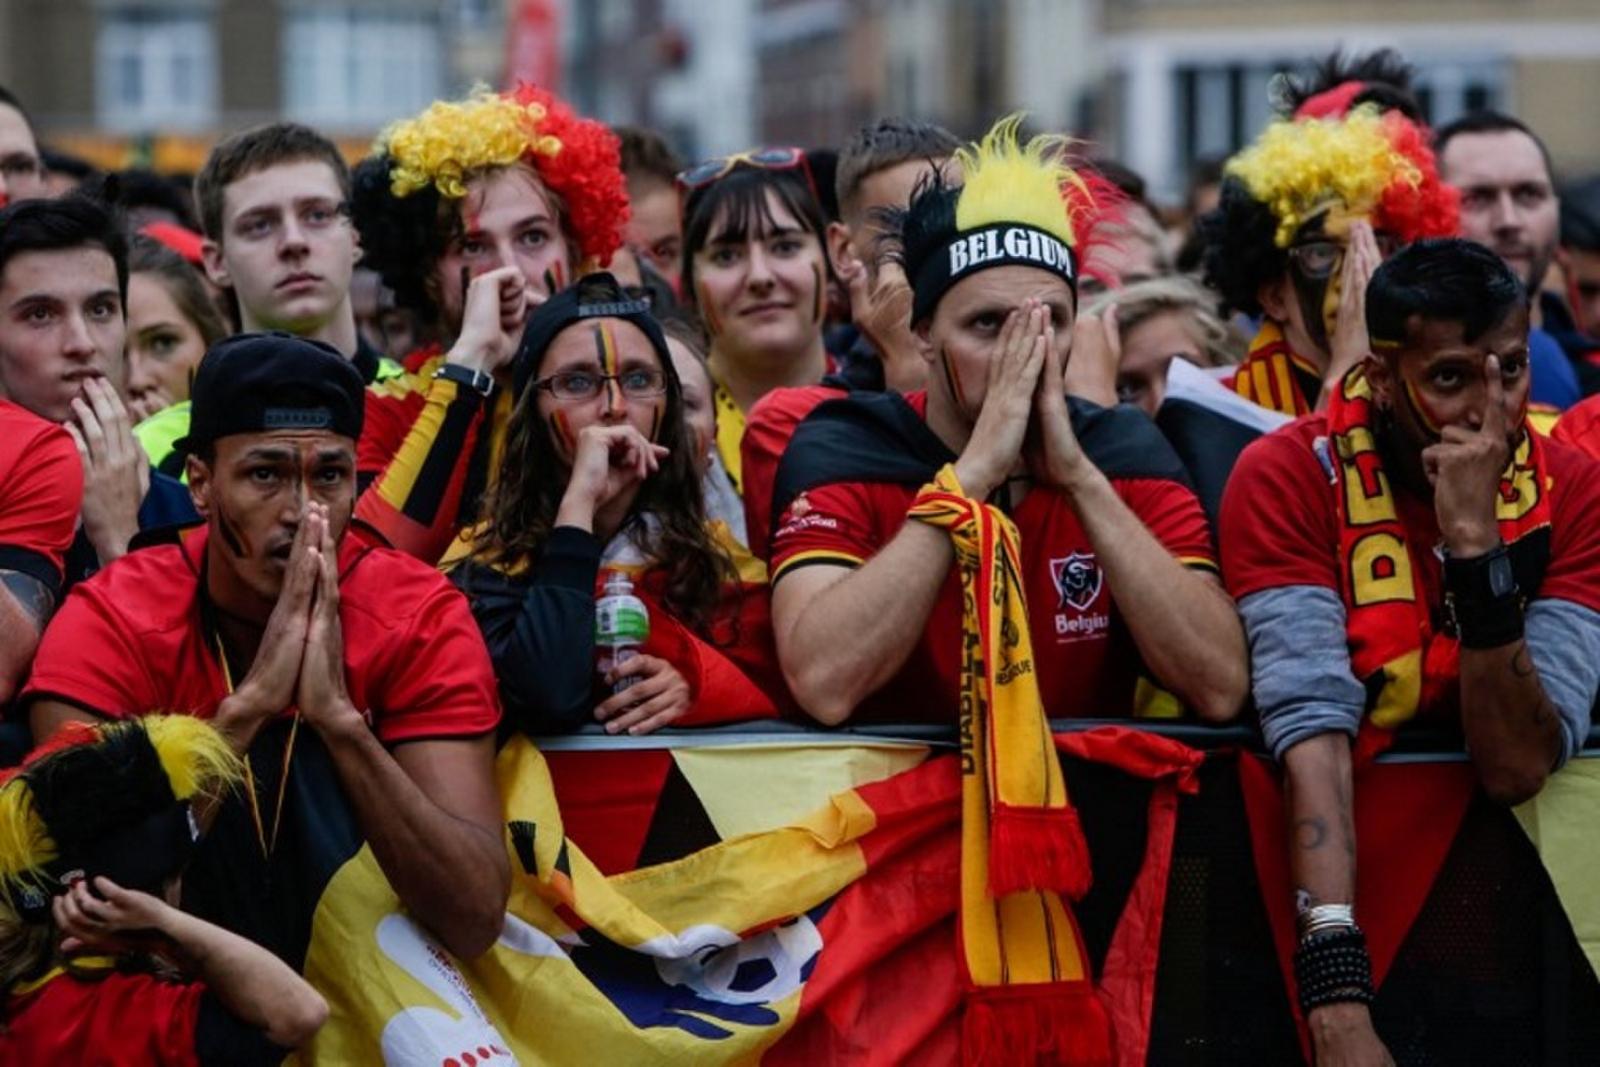 2018 FIFA World Cup Prediction: France vs Belgium